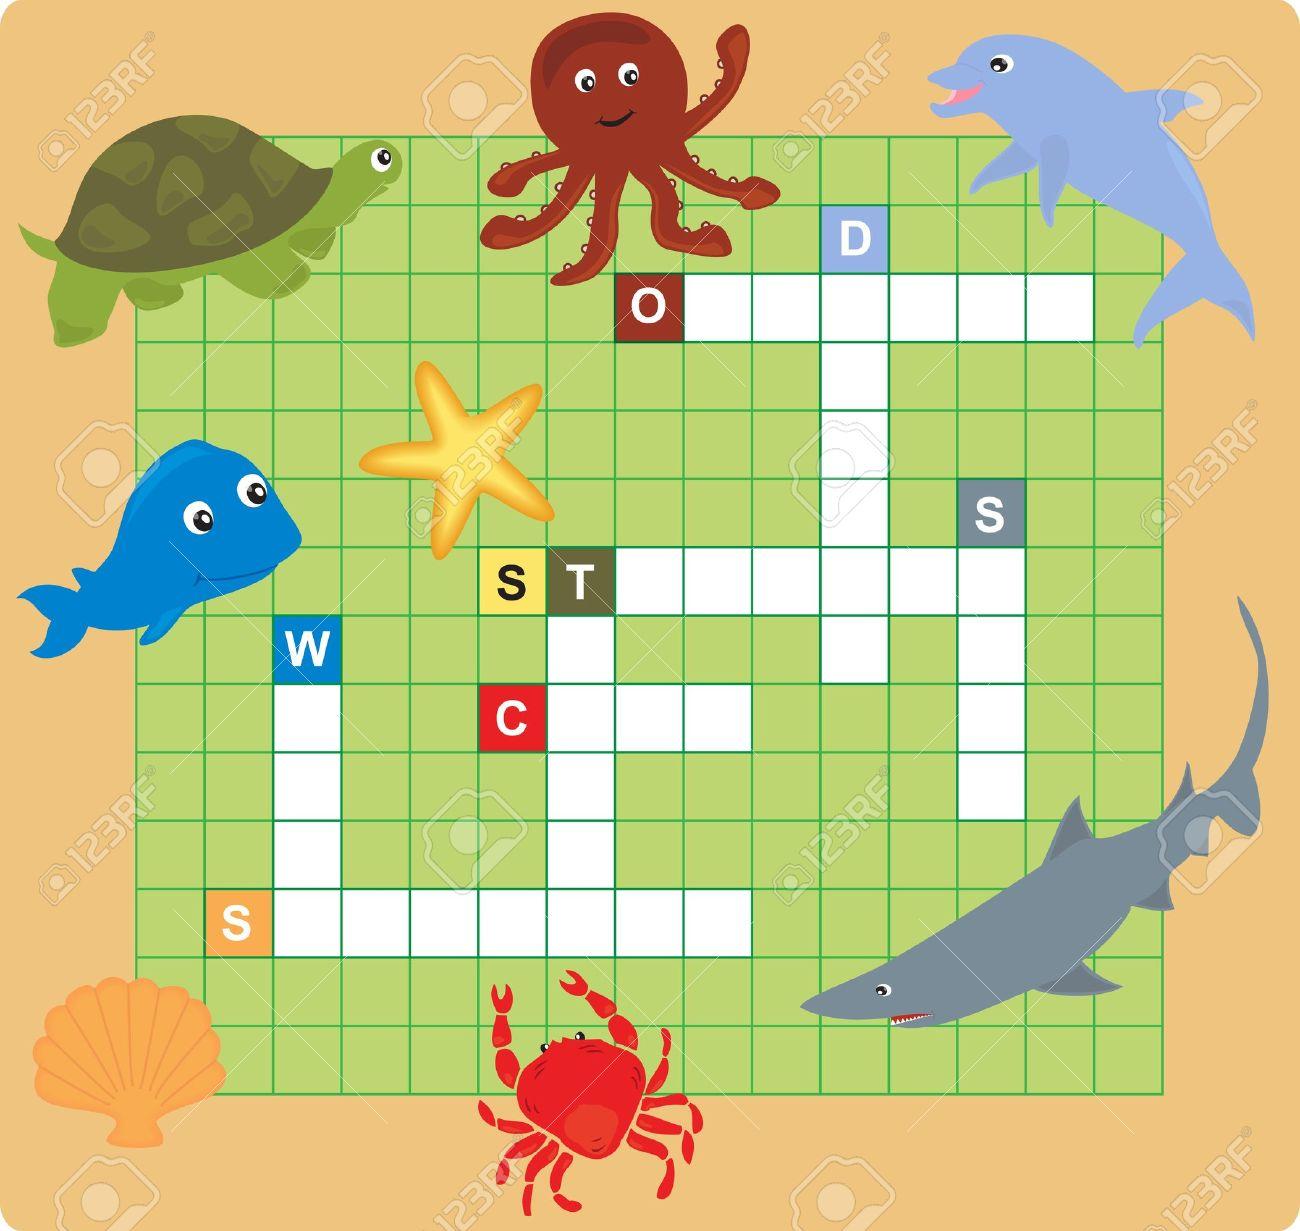 sea animal puzzle (crossword), words game for children. Stock Vector - 13896784